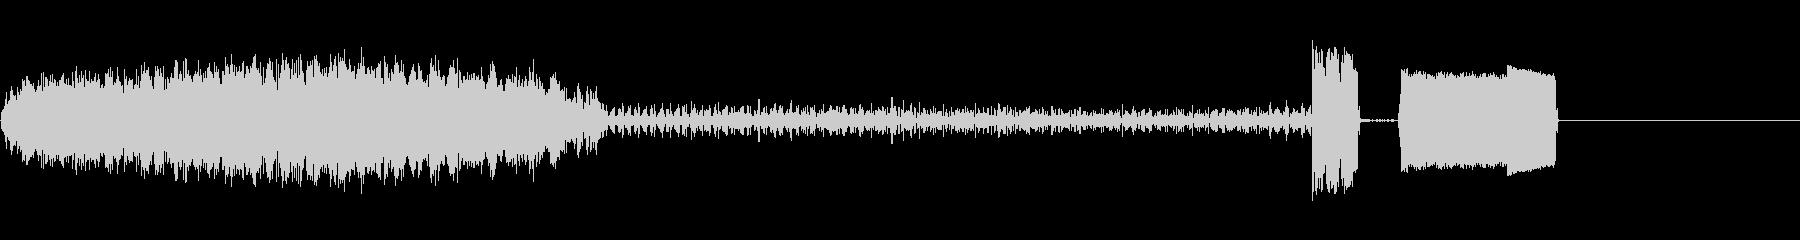 SciFi EC01_87_4の未再生の波形